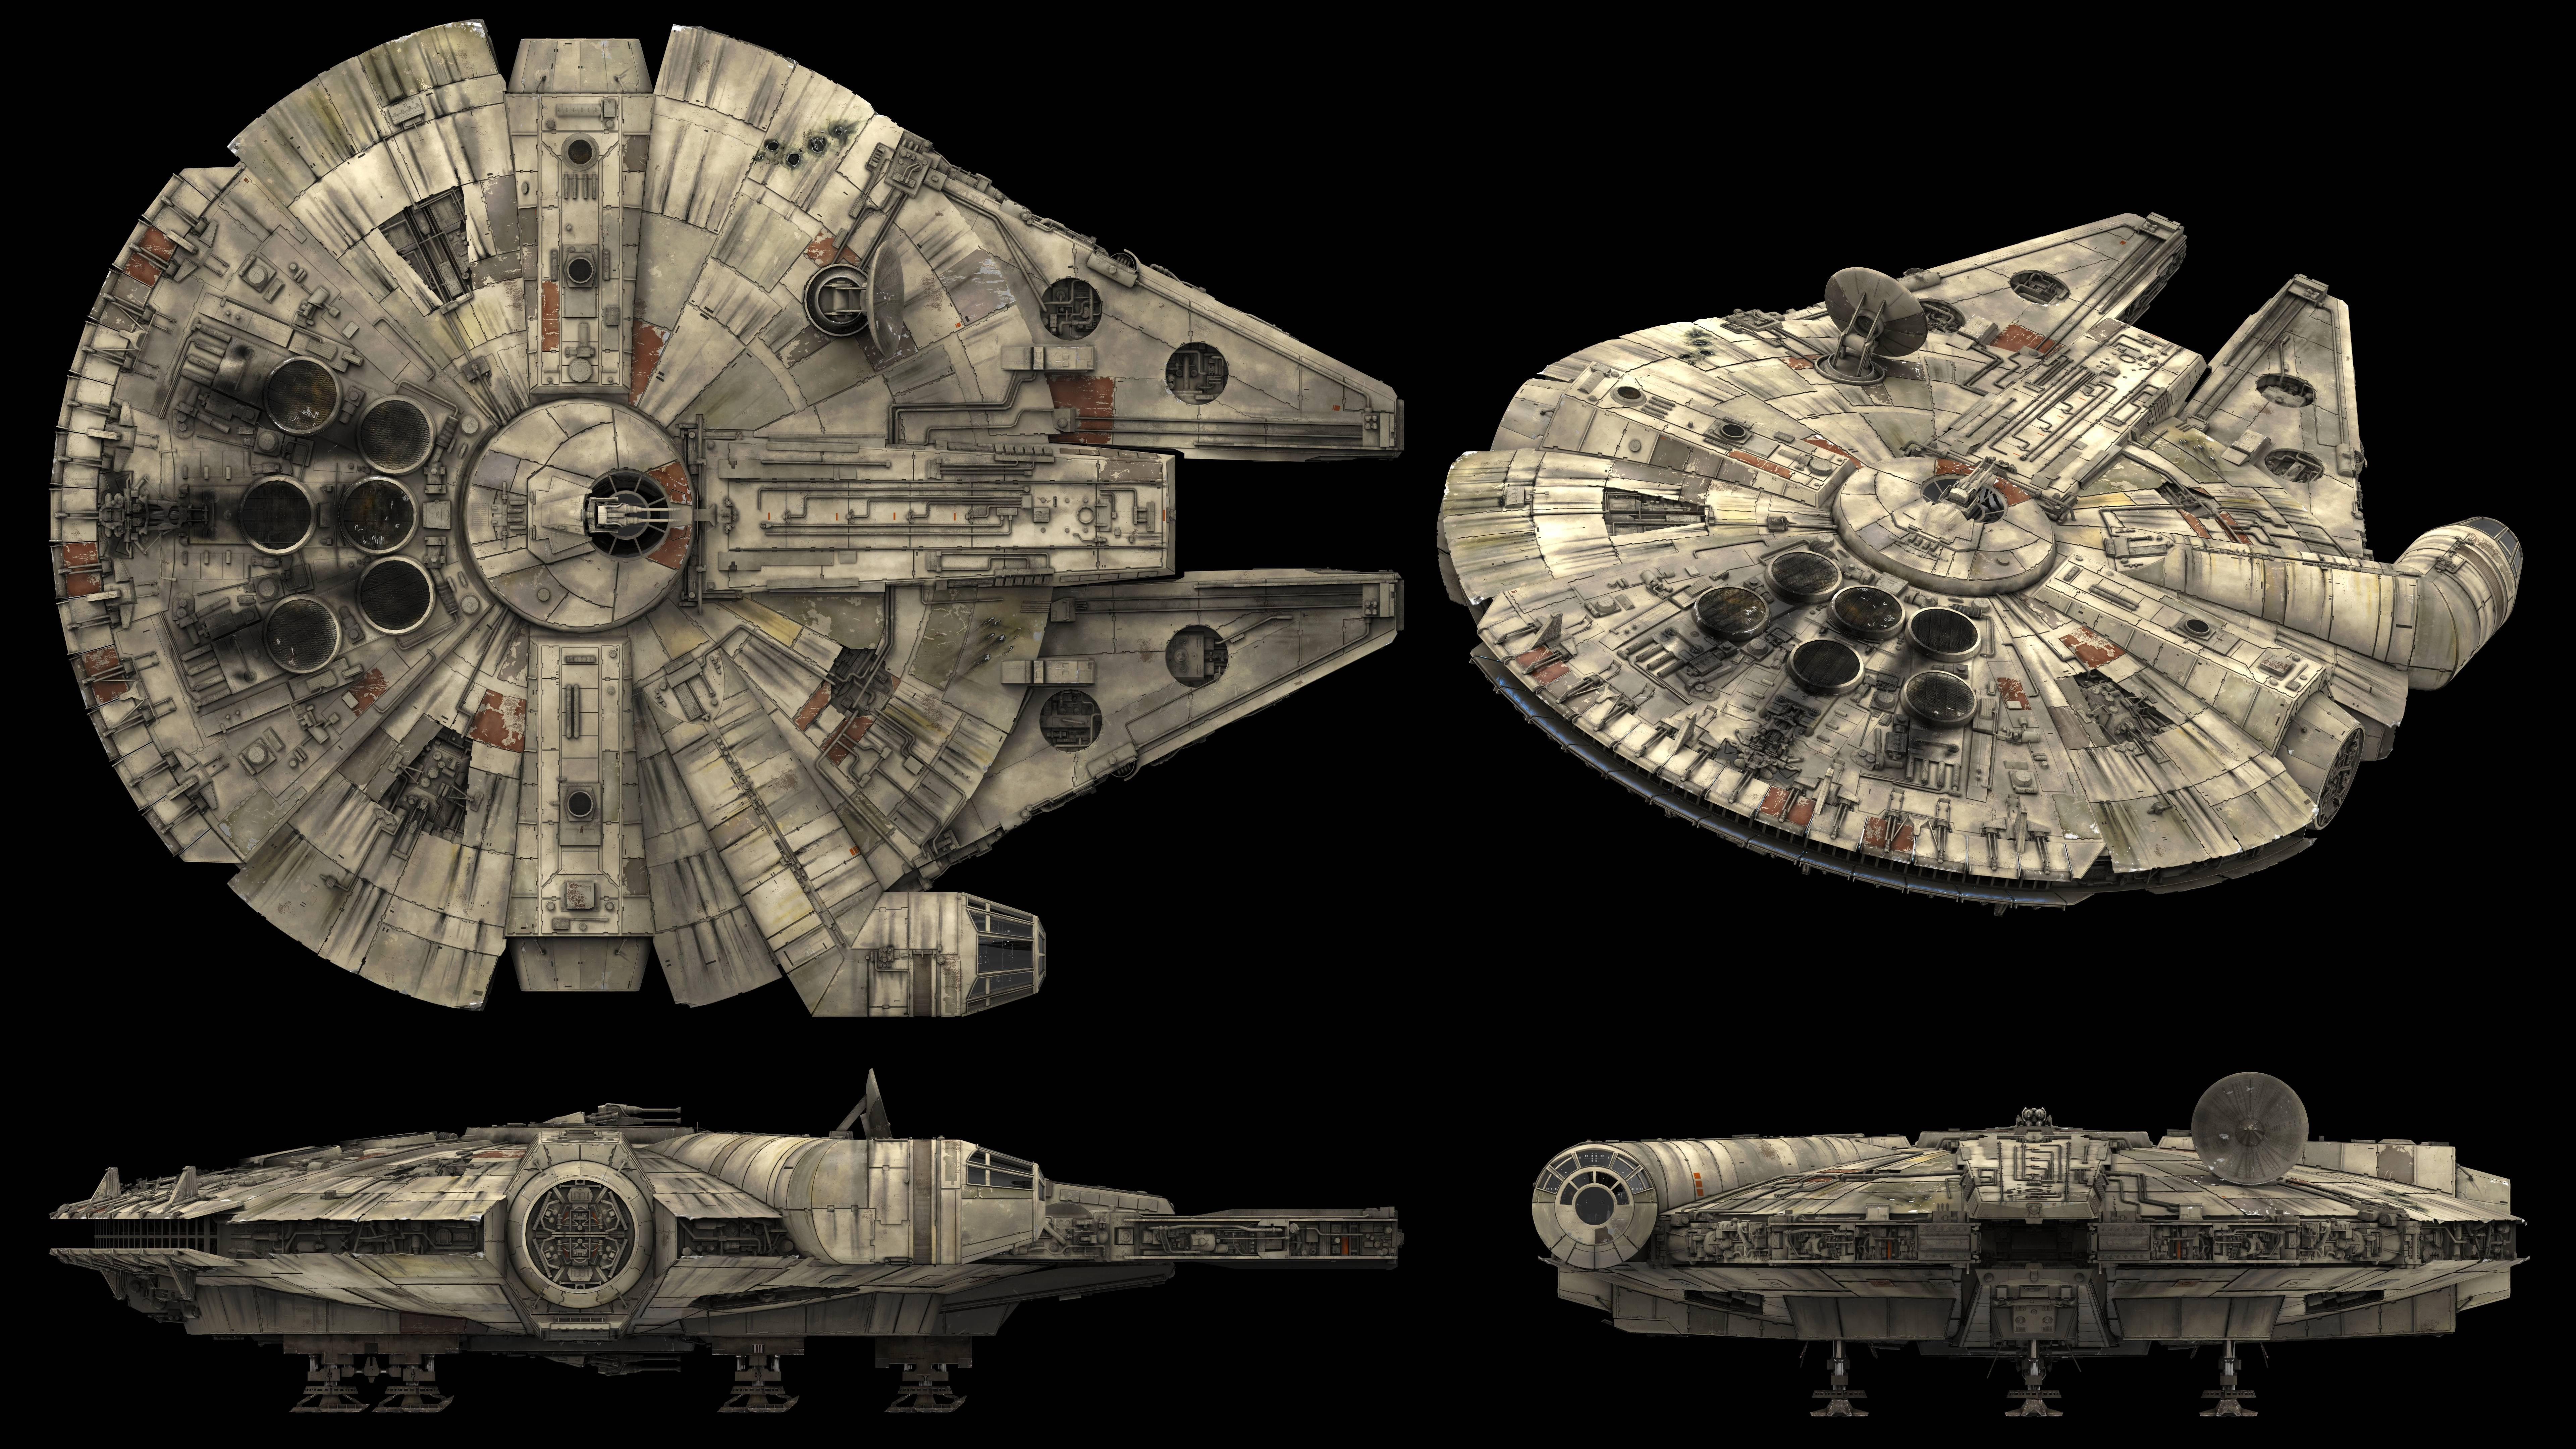 7680x4320 8k (7680x4320) Millennium Falcon